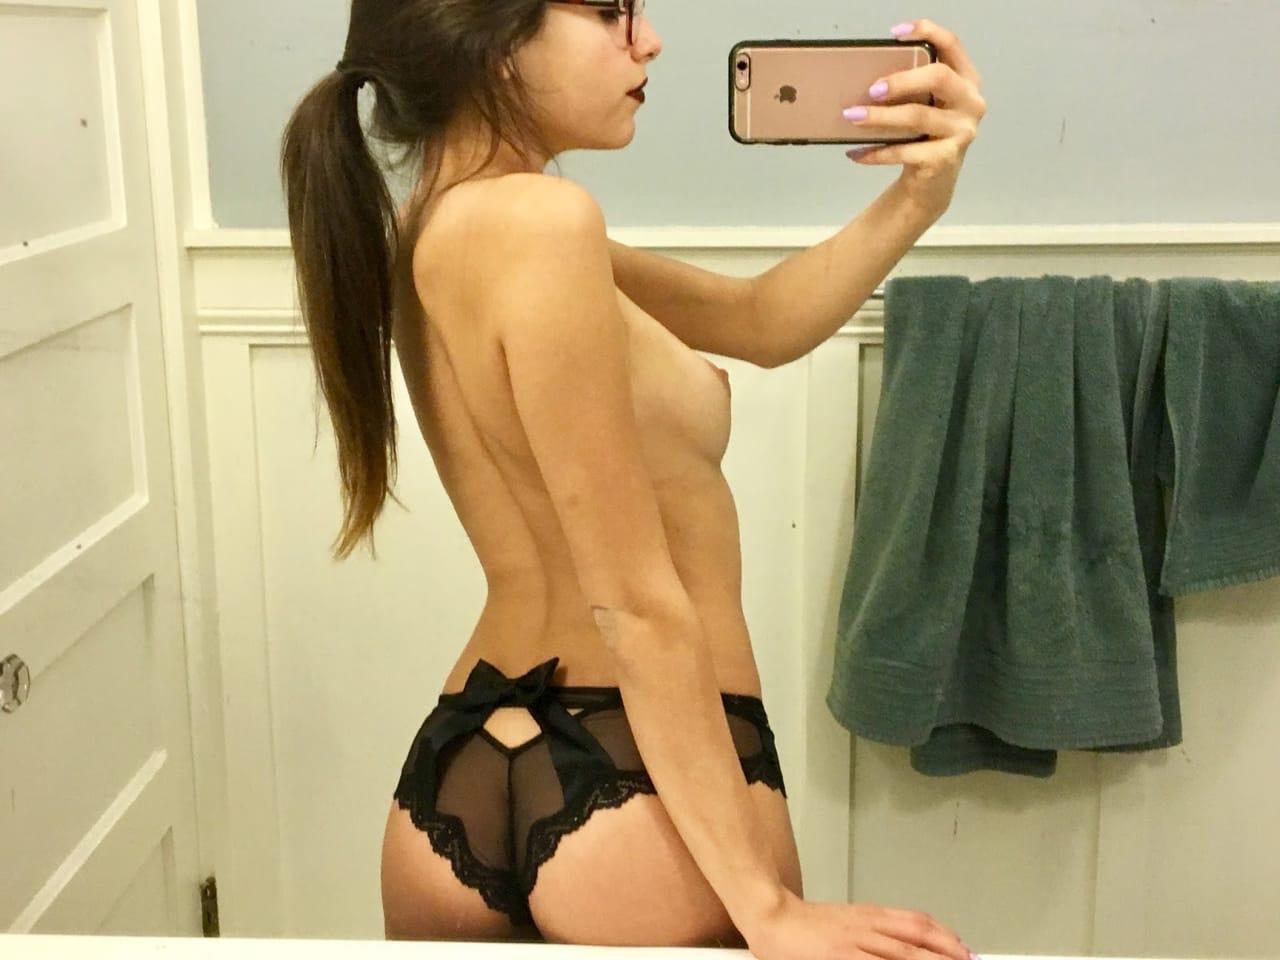 Fotos Mulheres Famosas Nuas paola oliveira pelada atriz da globo gostosa bombou na net